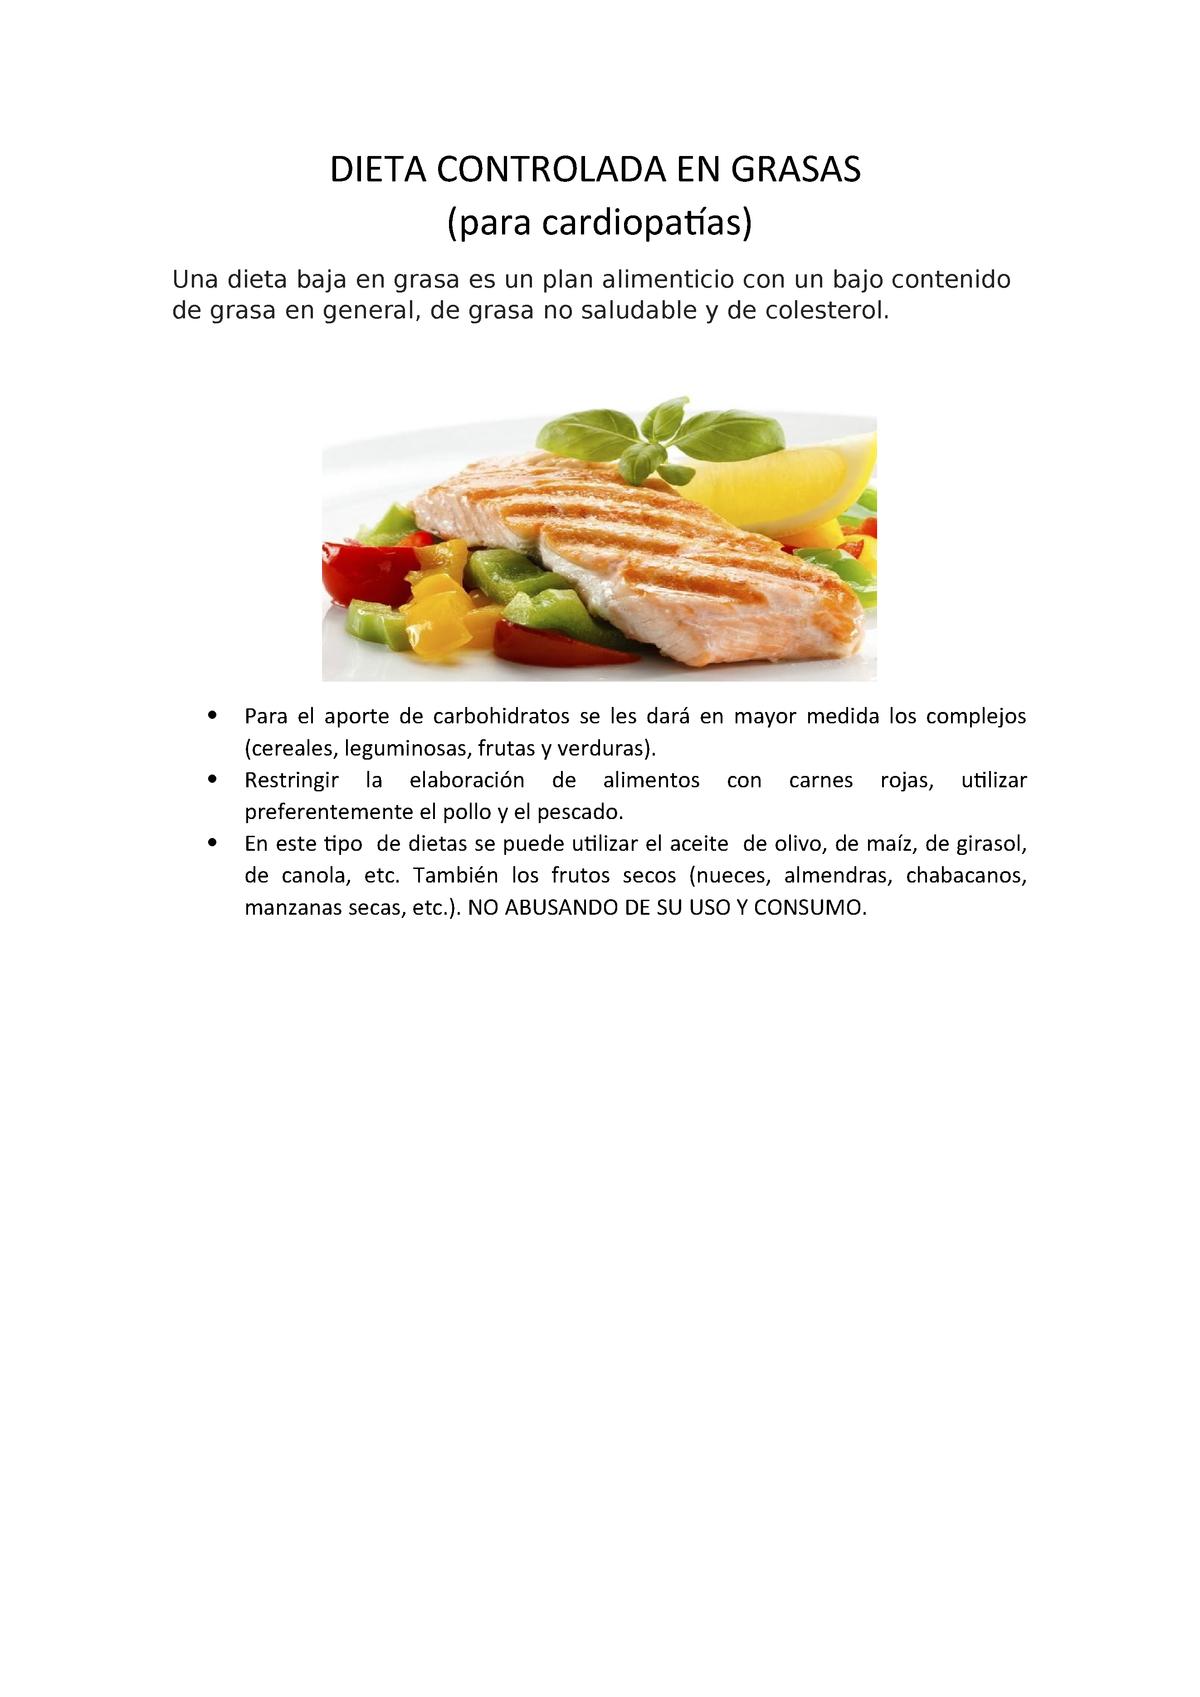 dieta hipograsa alimentos no permitidos